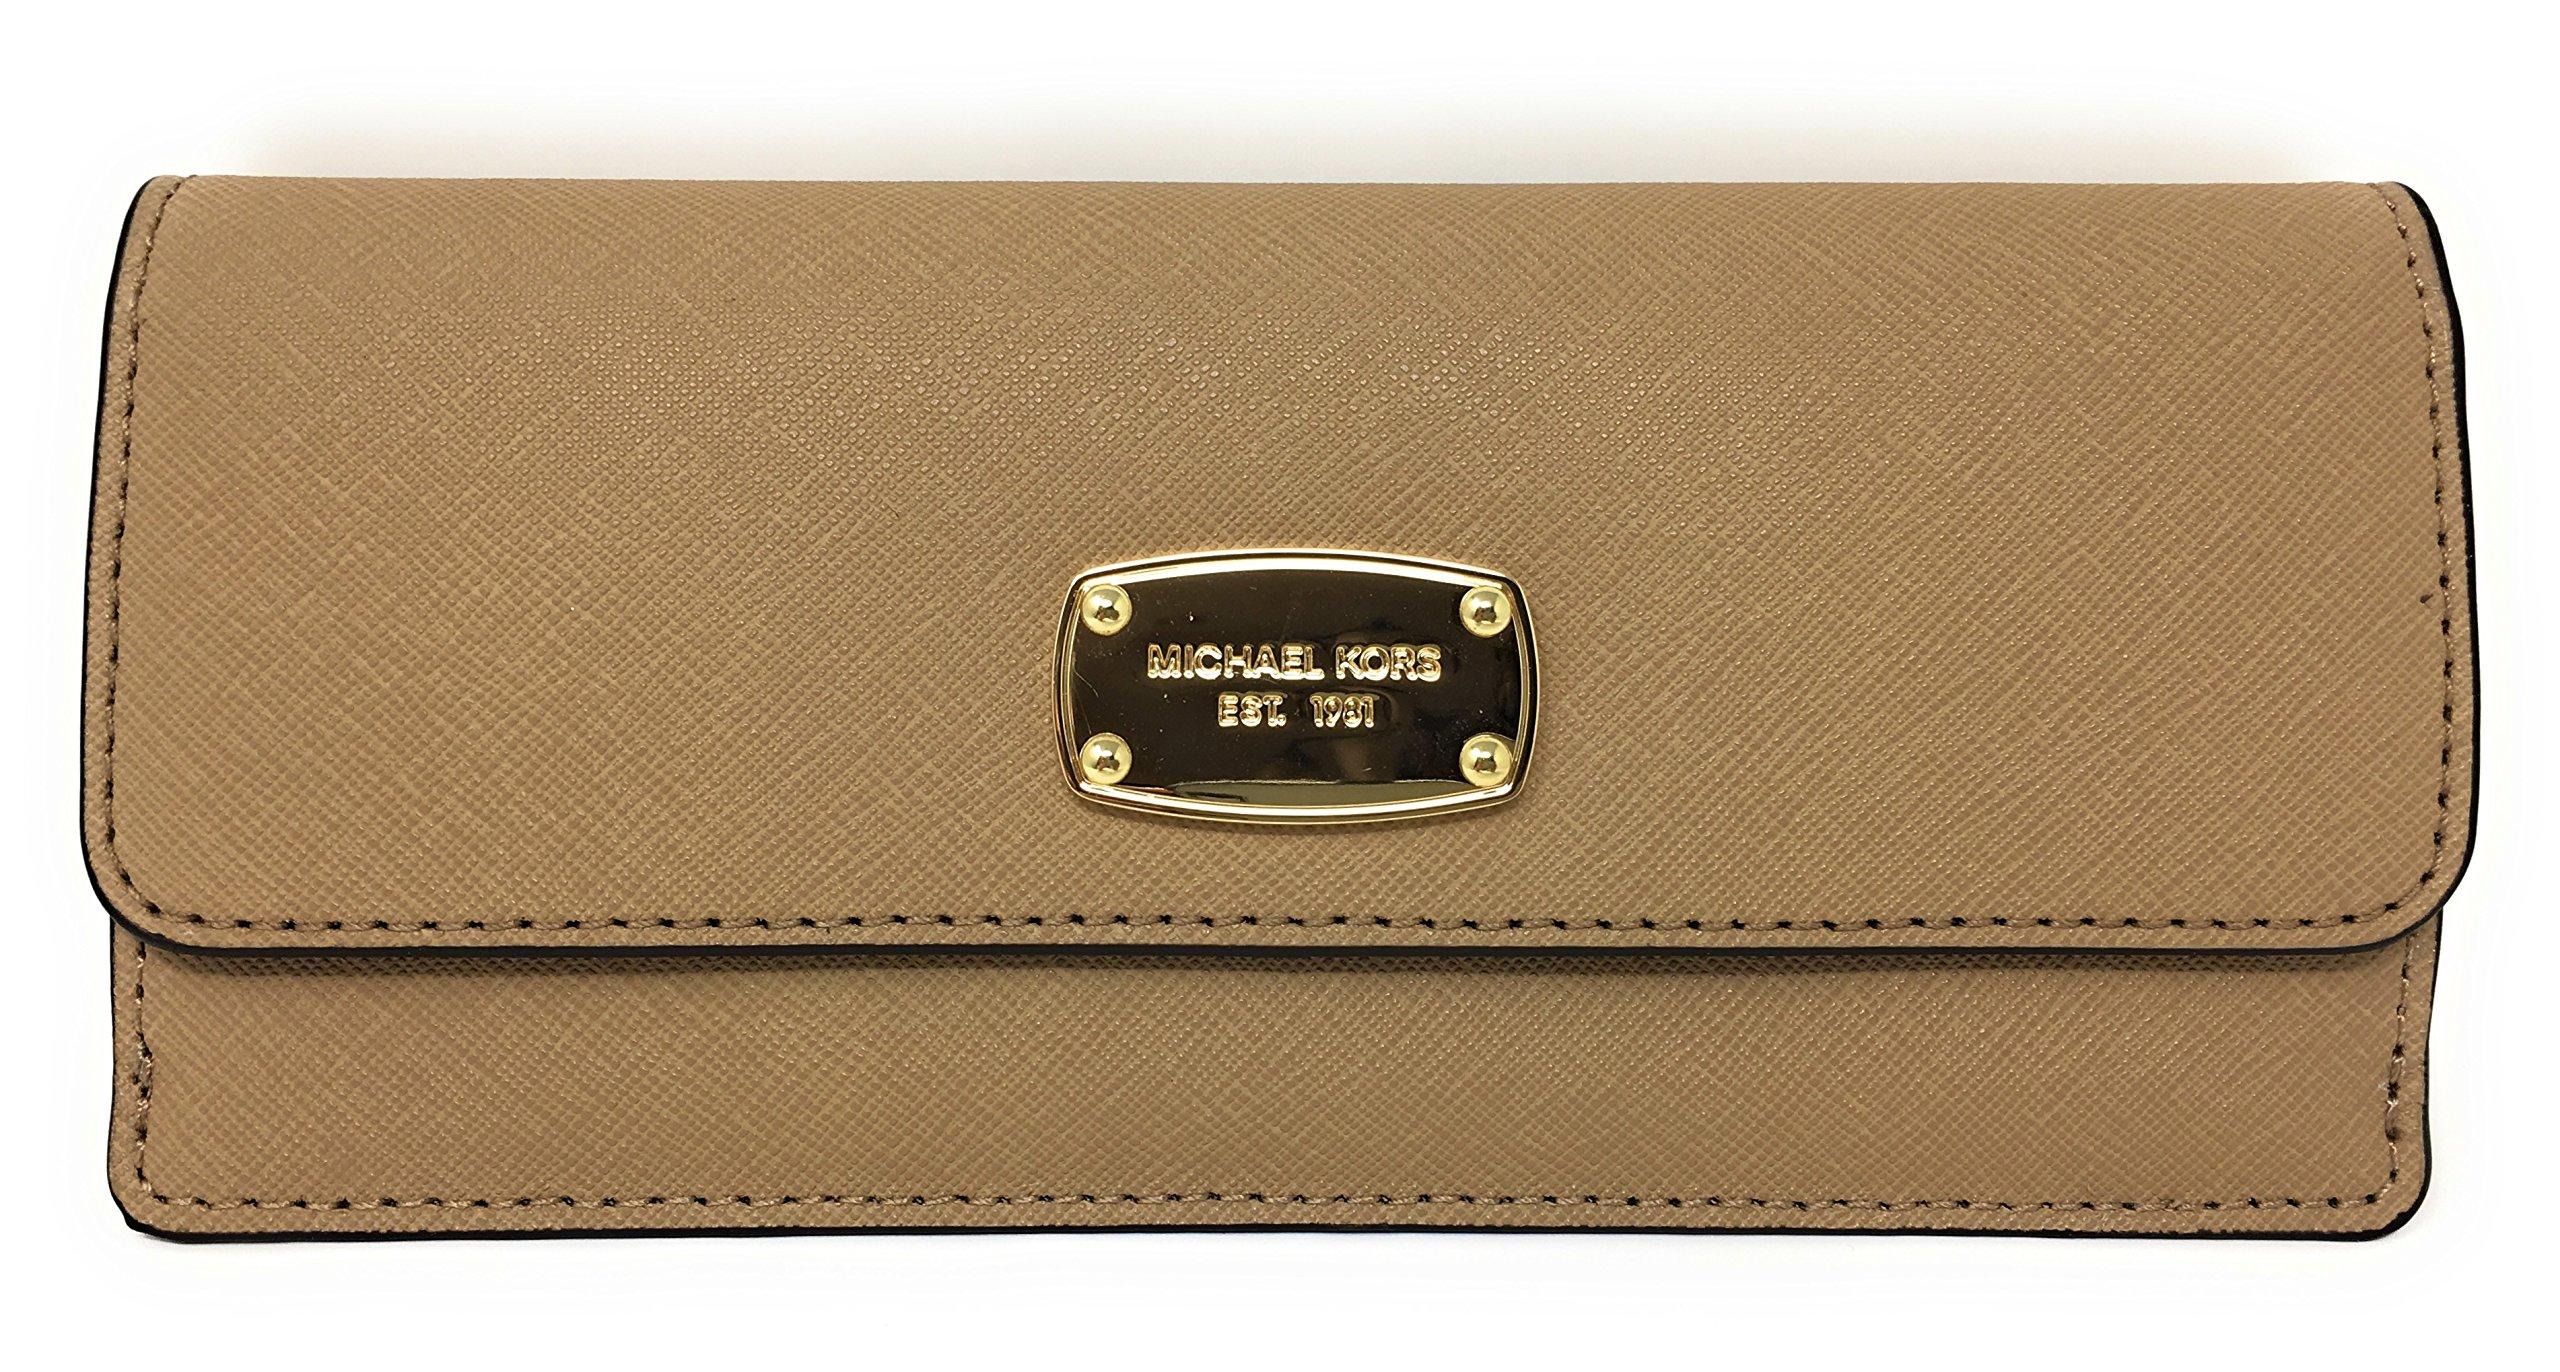 Michael Kors Jet Set Travel Flat Saffiano Leather Wallet (Dark Camel)